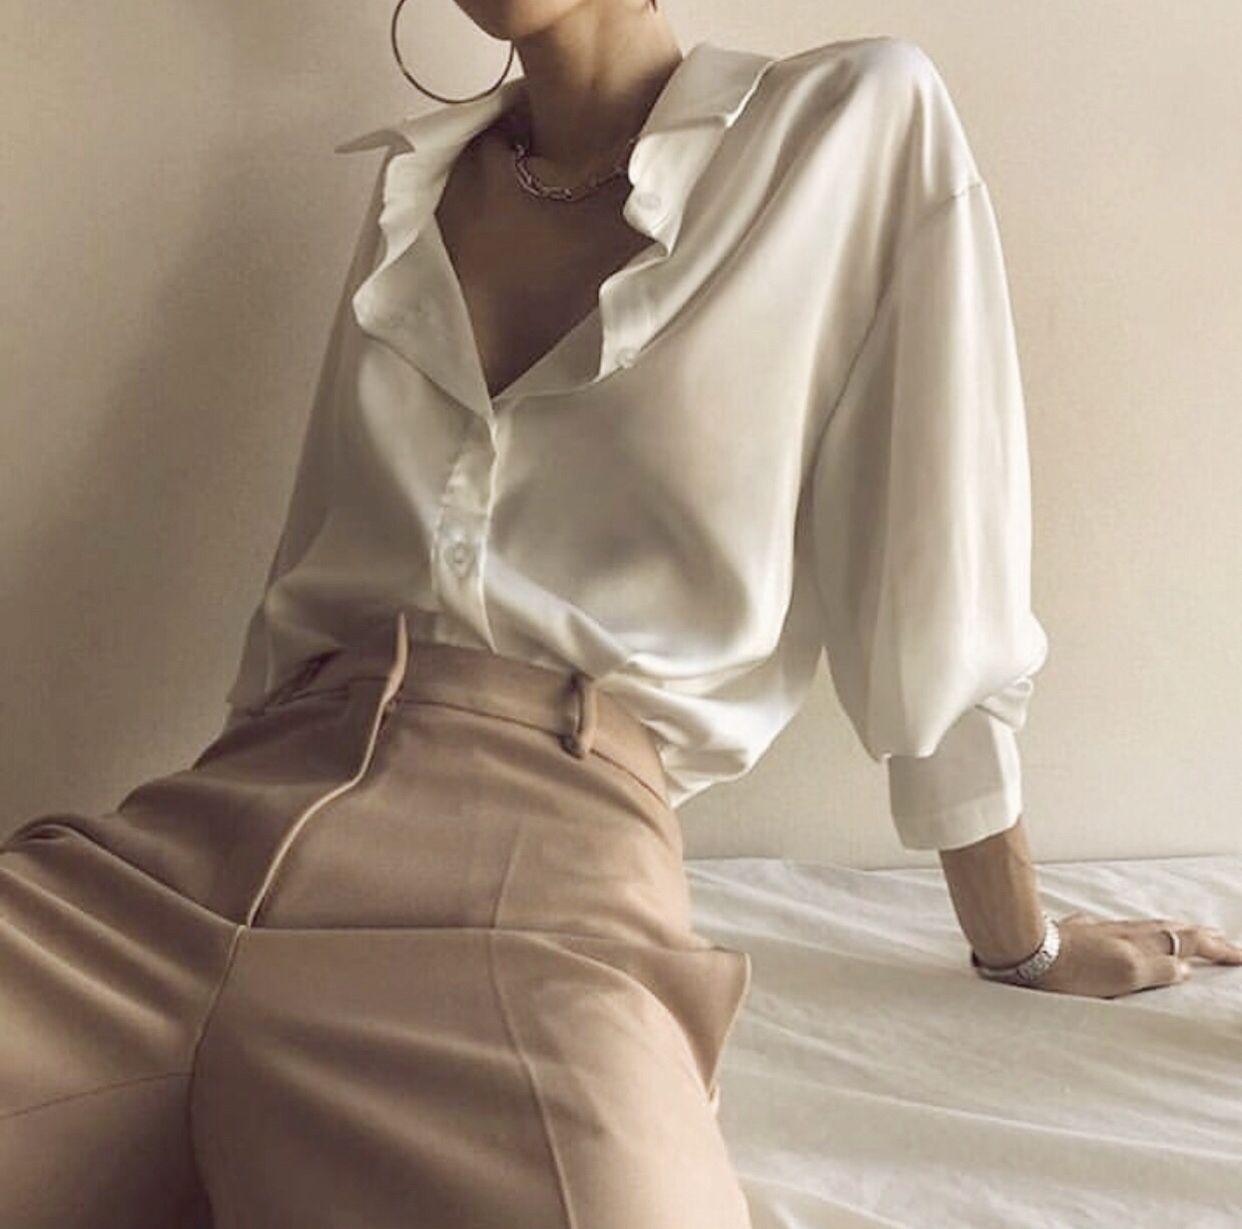 11 Fashion Trends for Summer 2020 – Beige Ain't Borin'